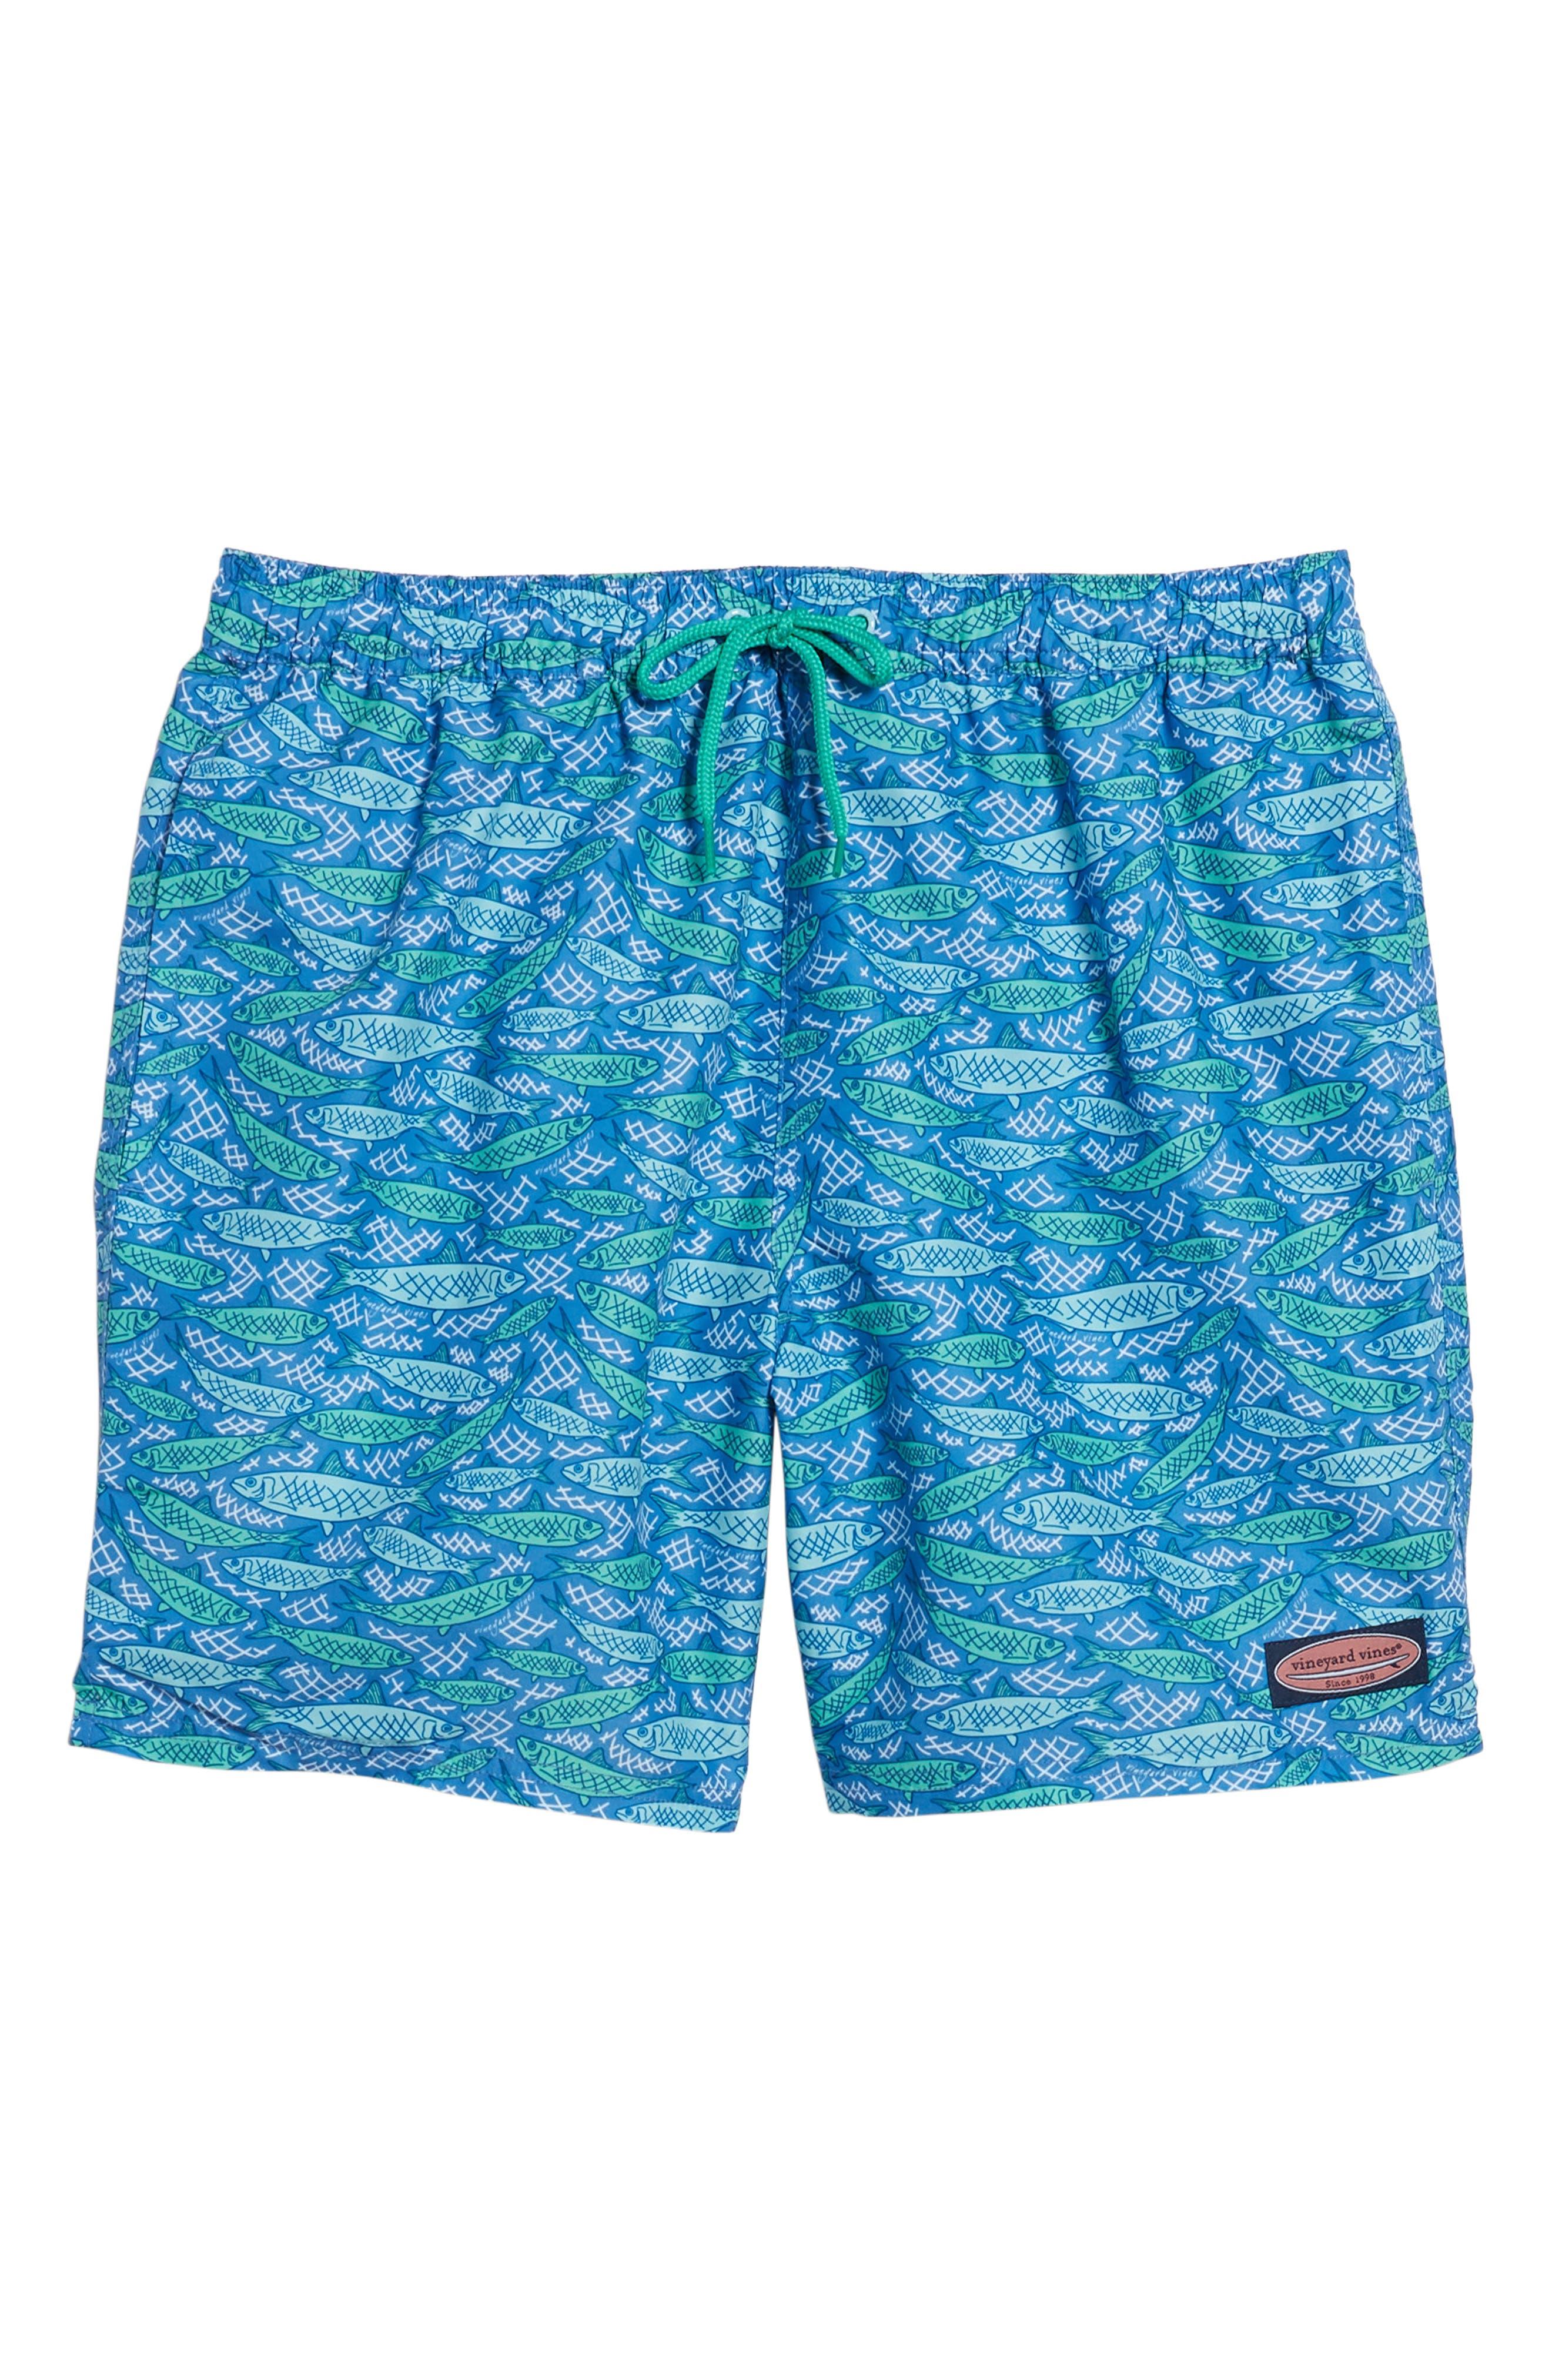 Chappy Fish Scales Print Swim Trunks,                             Alternate thumbnail 6, color,                             Harbor Cay